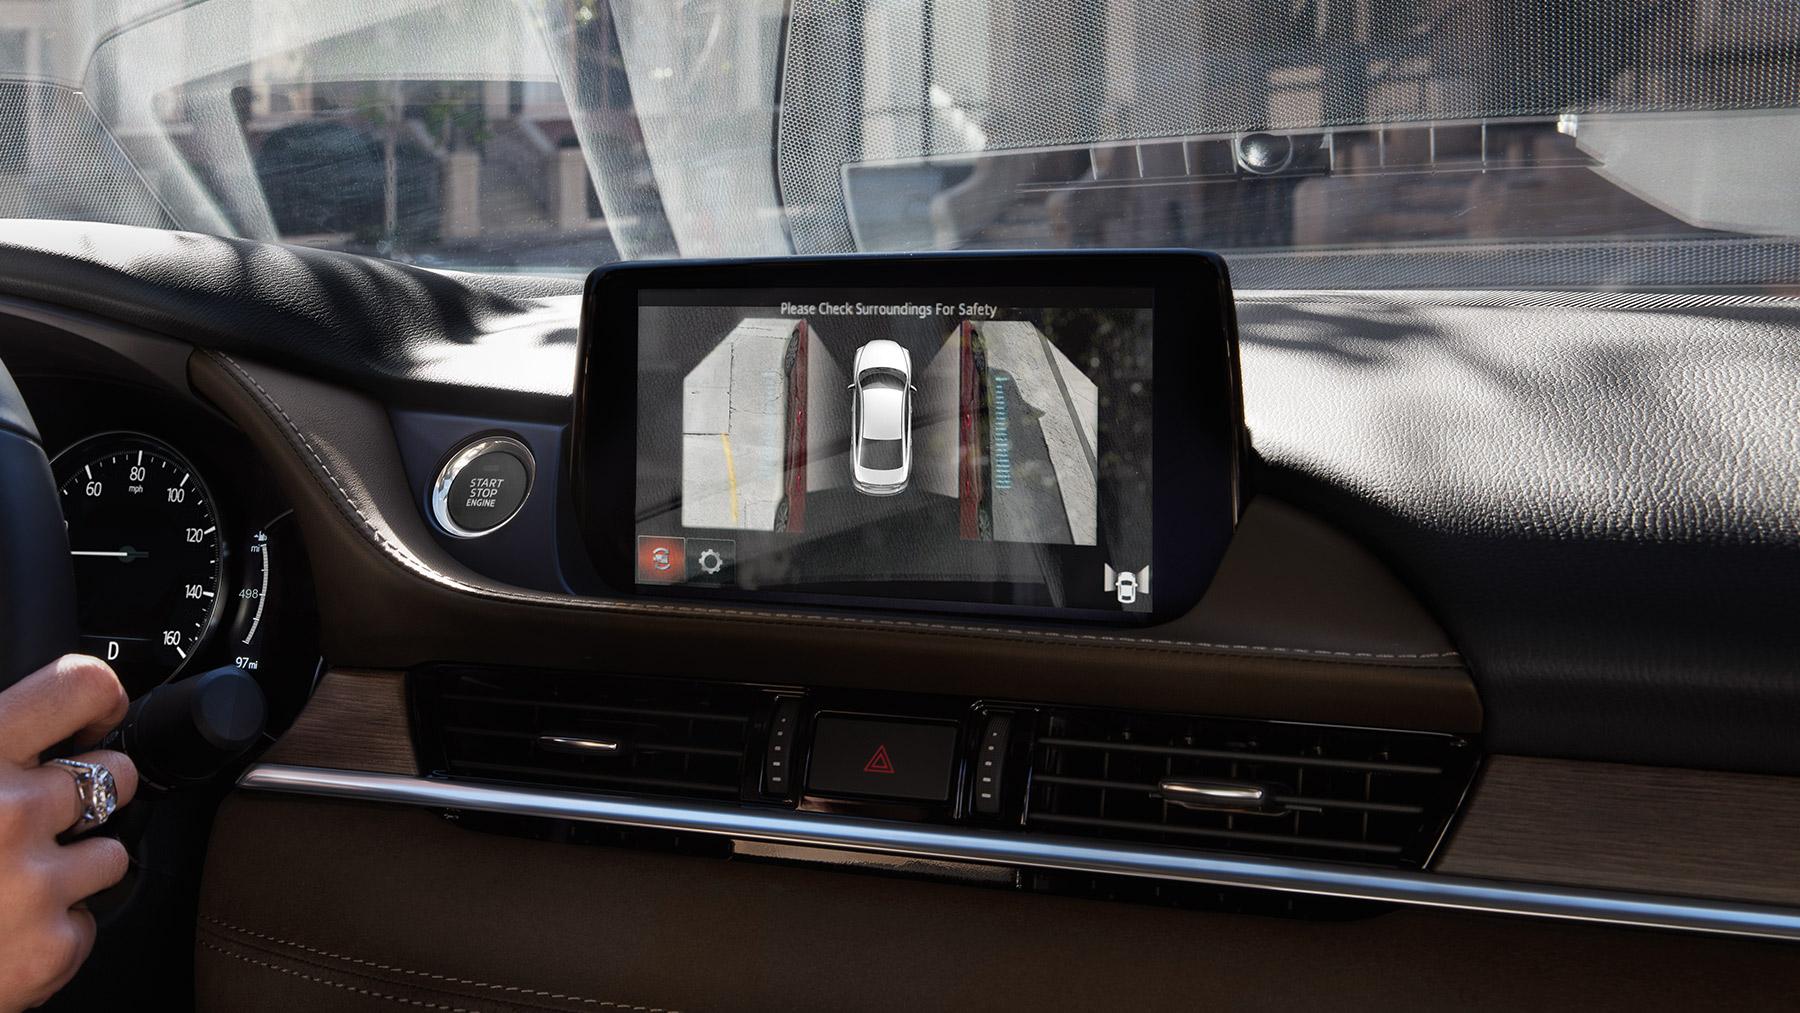 2020 MAZDA6 Touchscreen